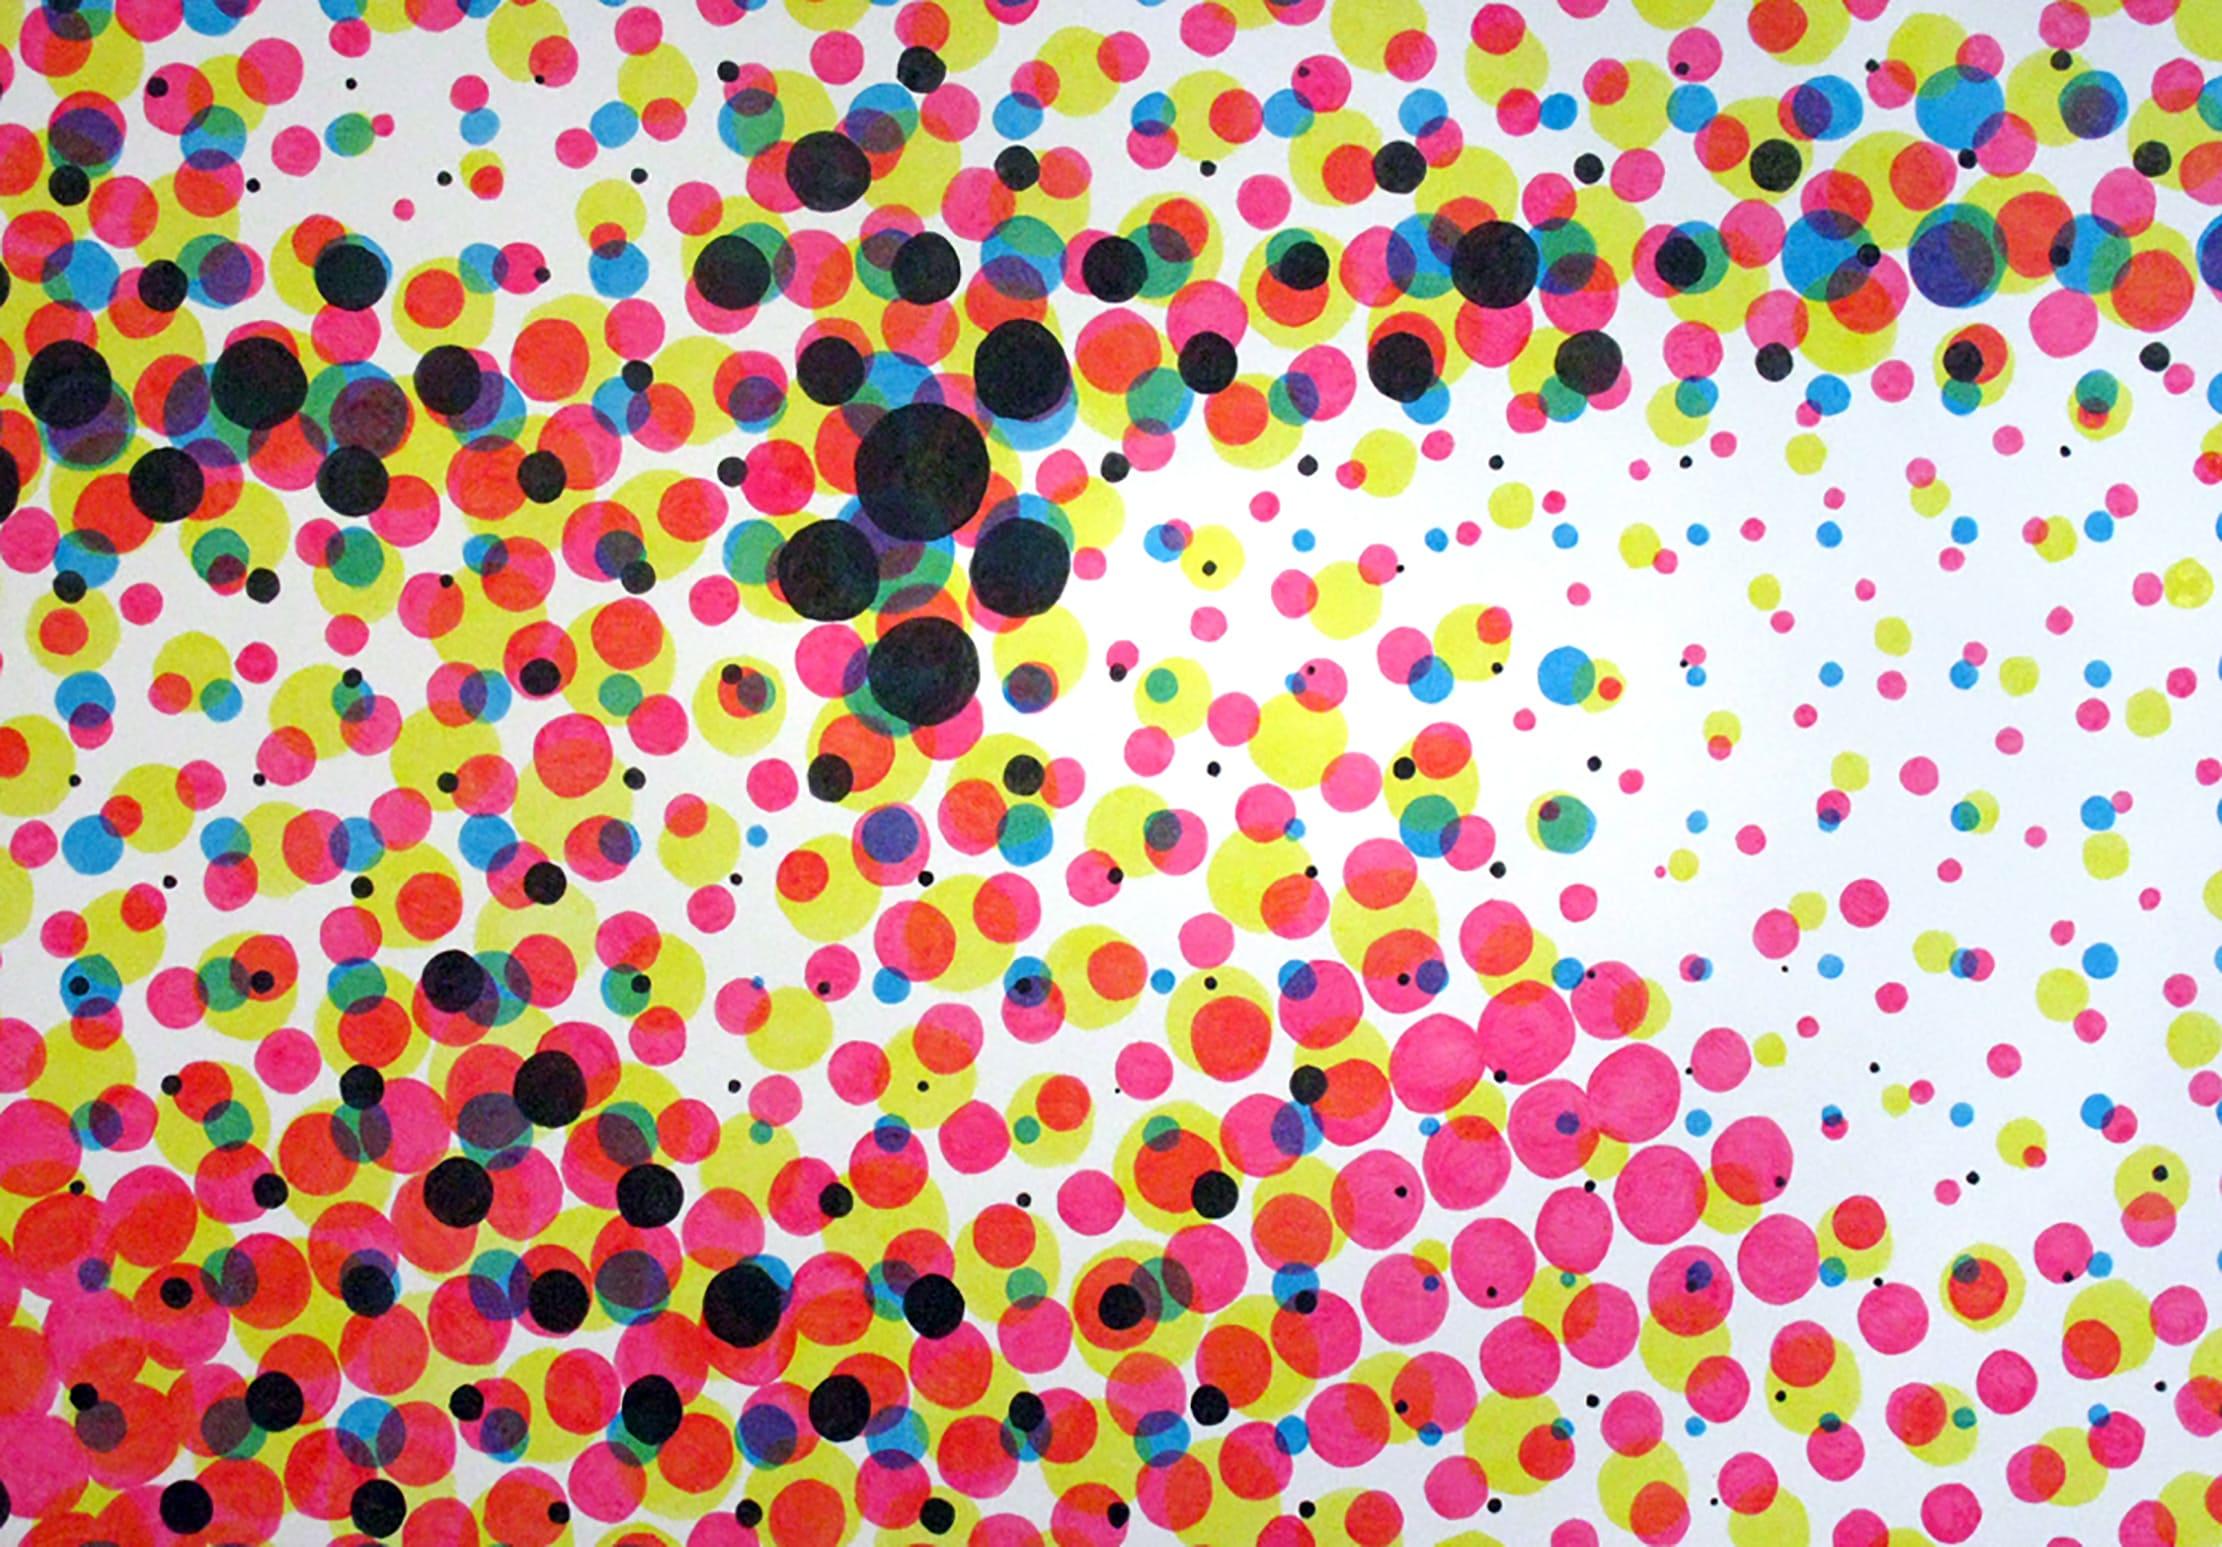 color painting midtone esteban peña art